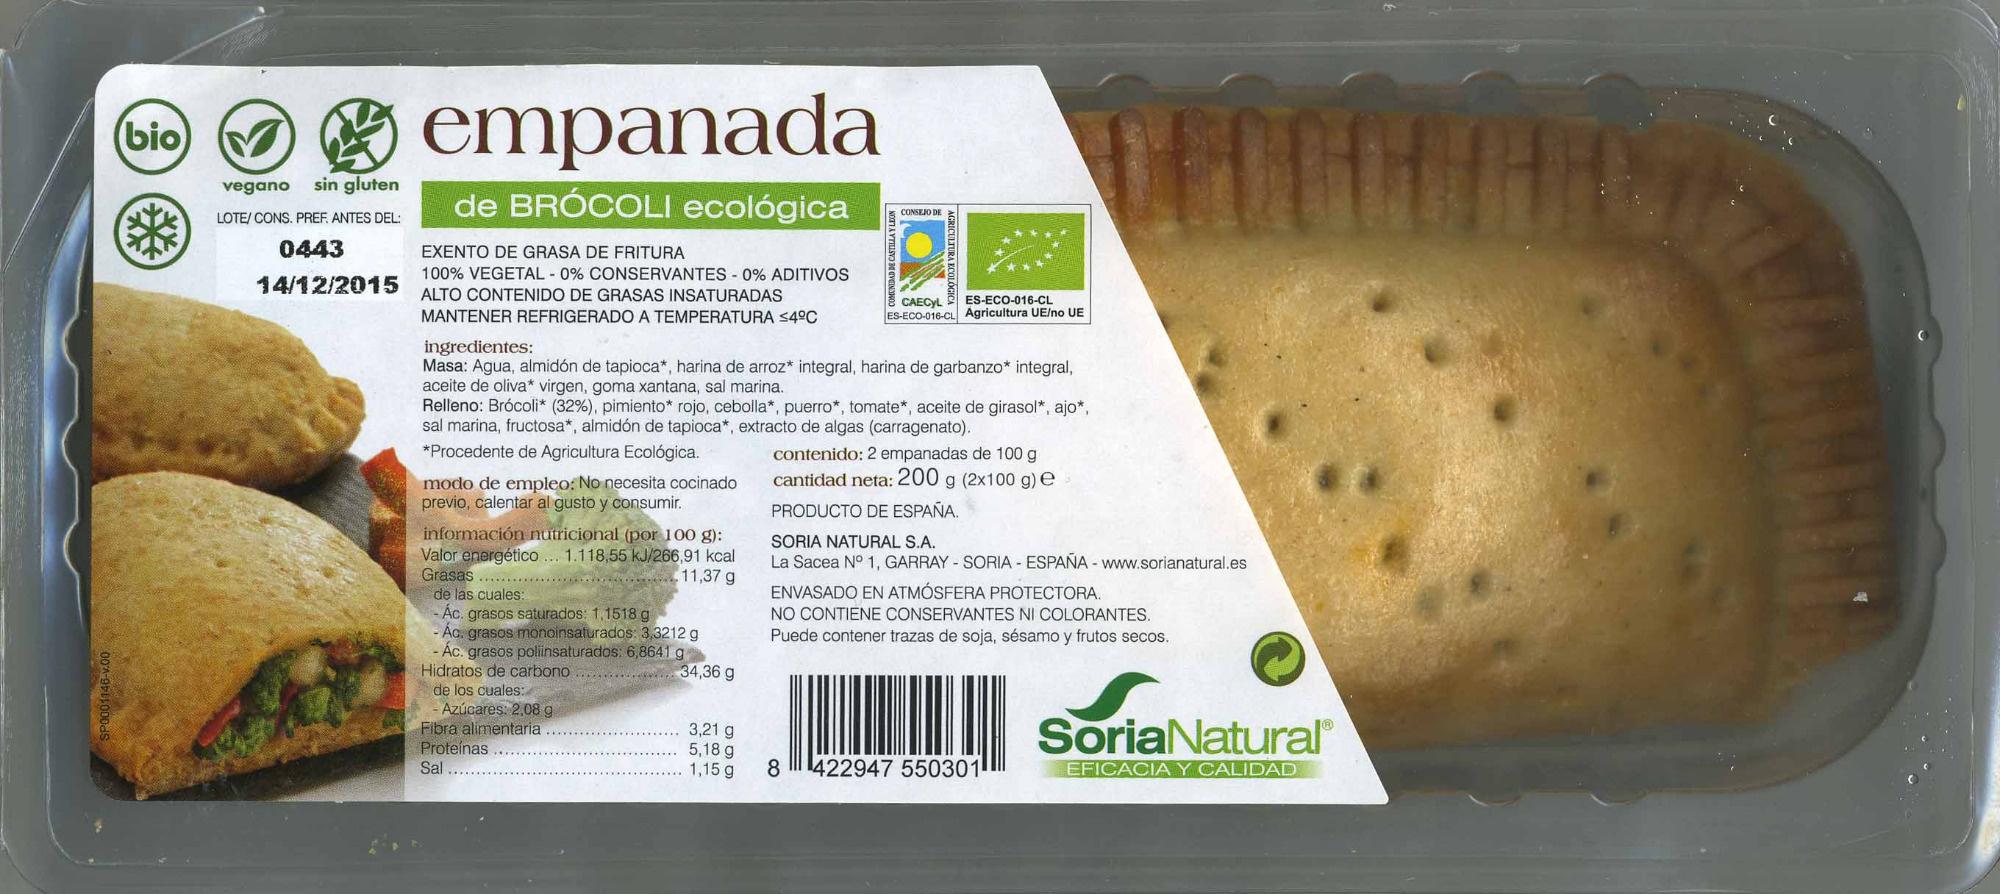 Empanada vegetal de brócoli - Producto